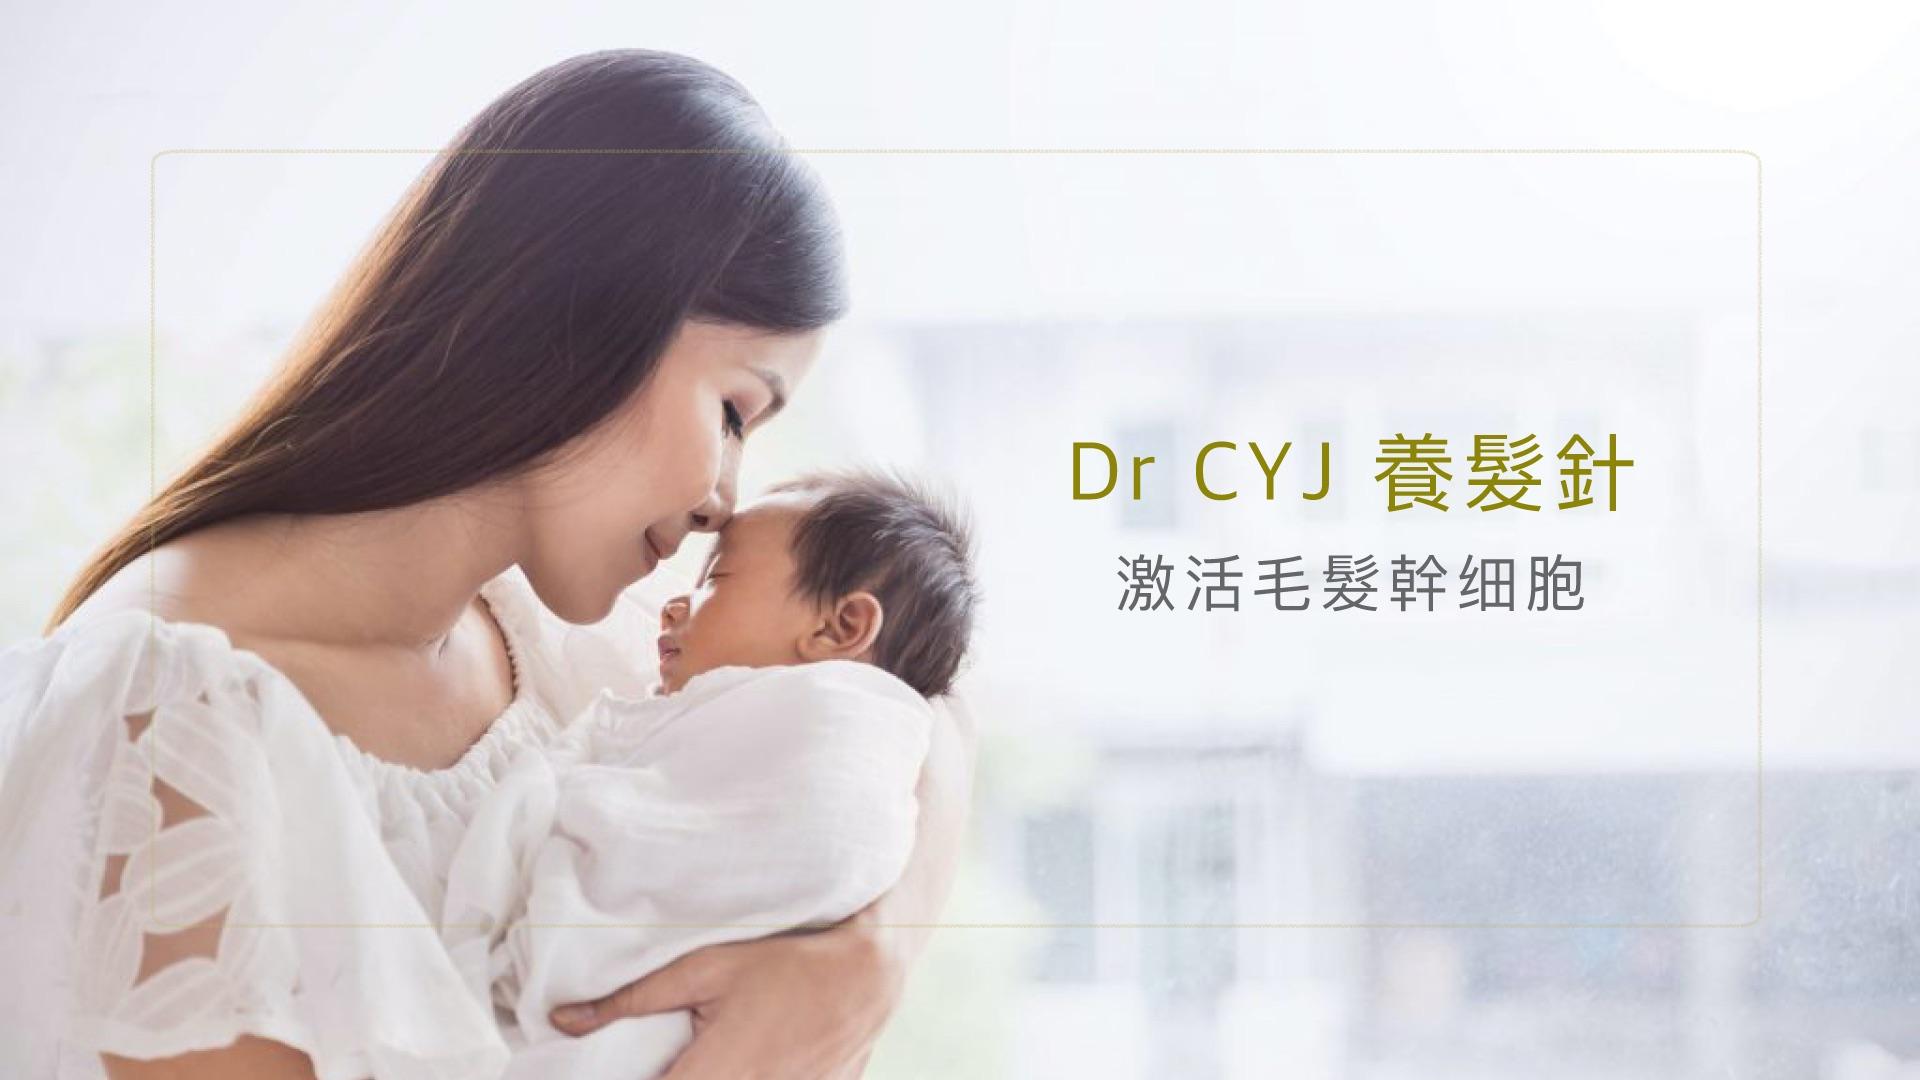 DR CYJ 養髮針